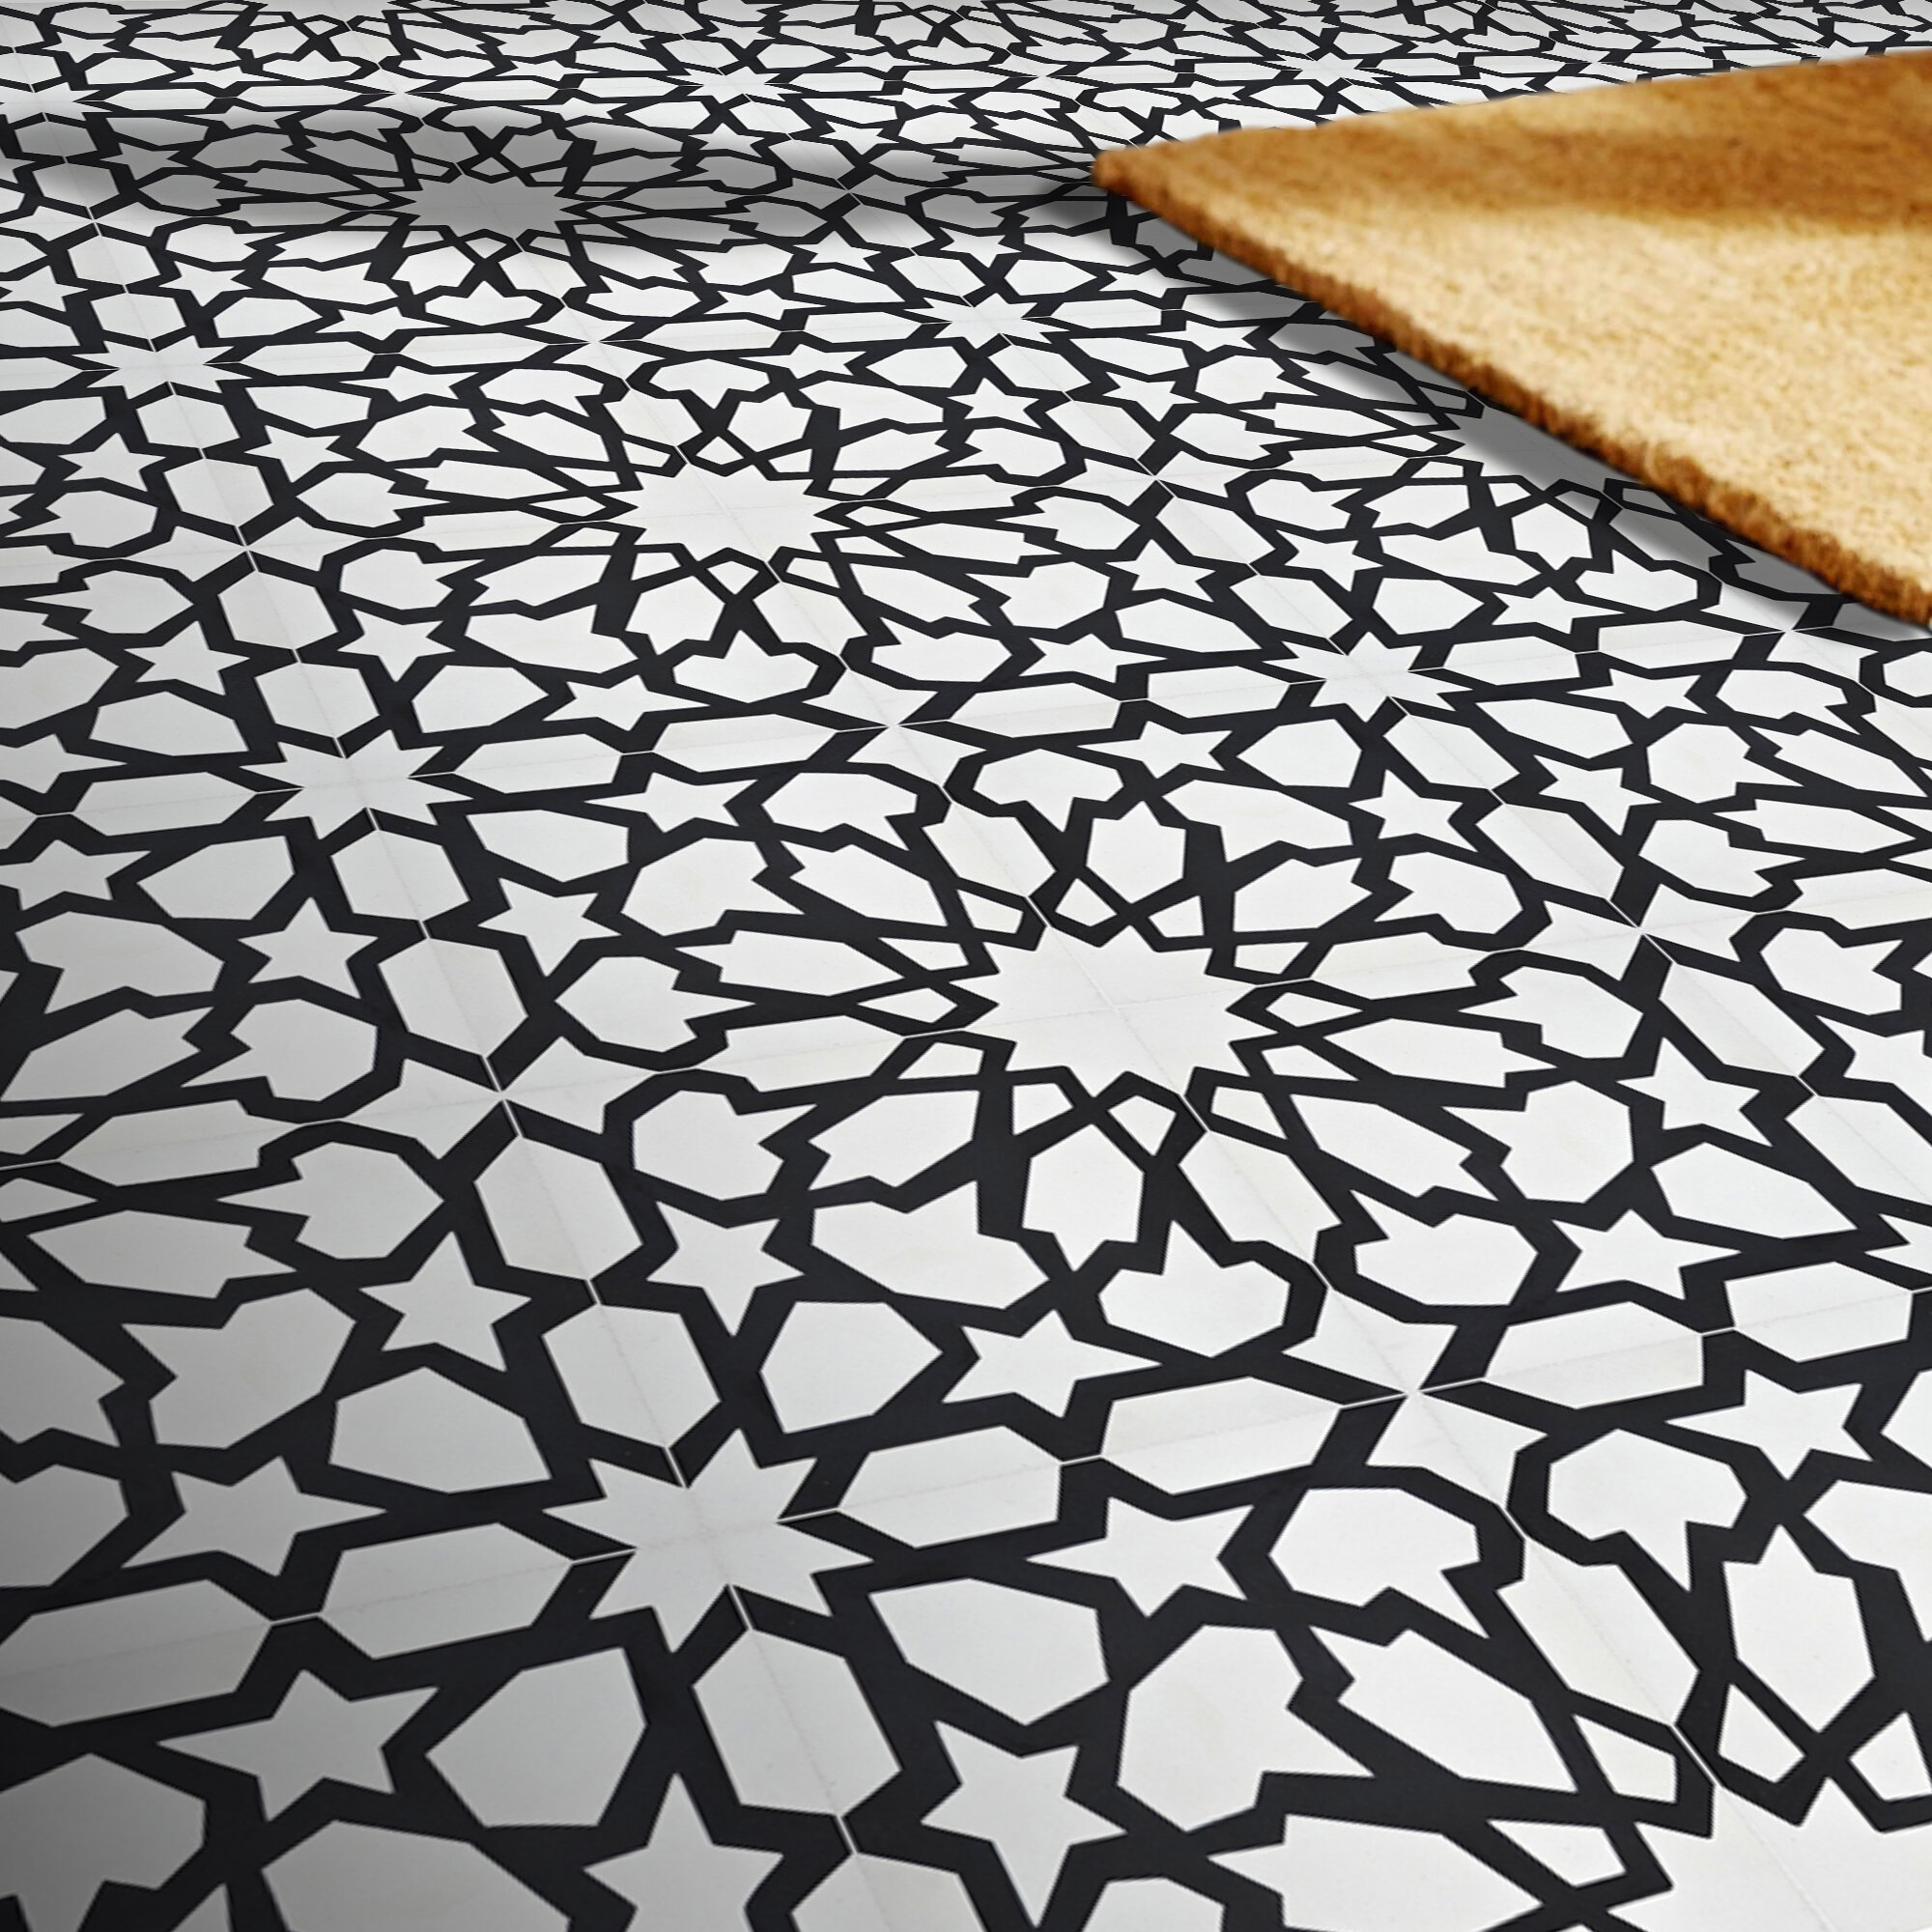 Moroccan Mosaic Tile House Bahja 8 X 8 Cement Patterned Wall Floor Tile Wayfair